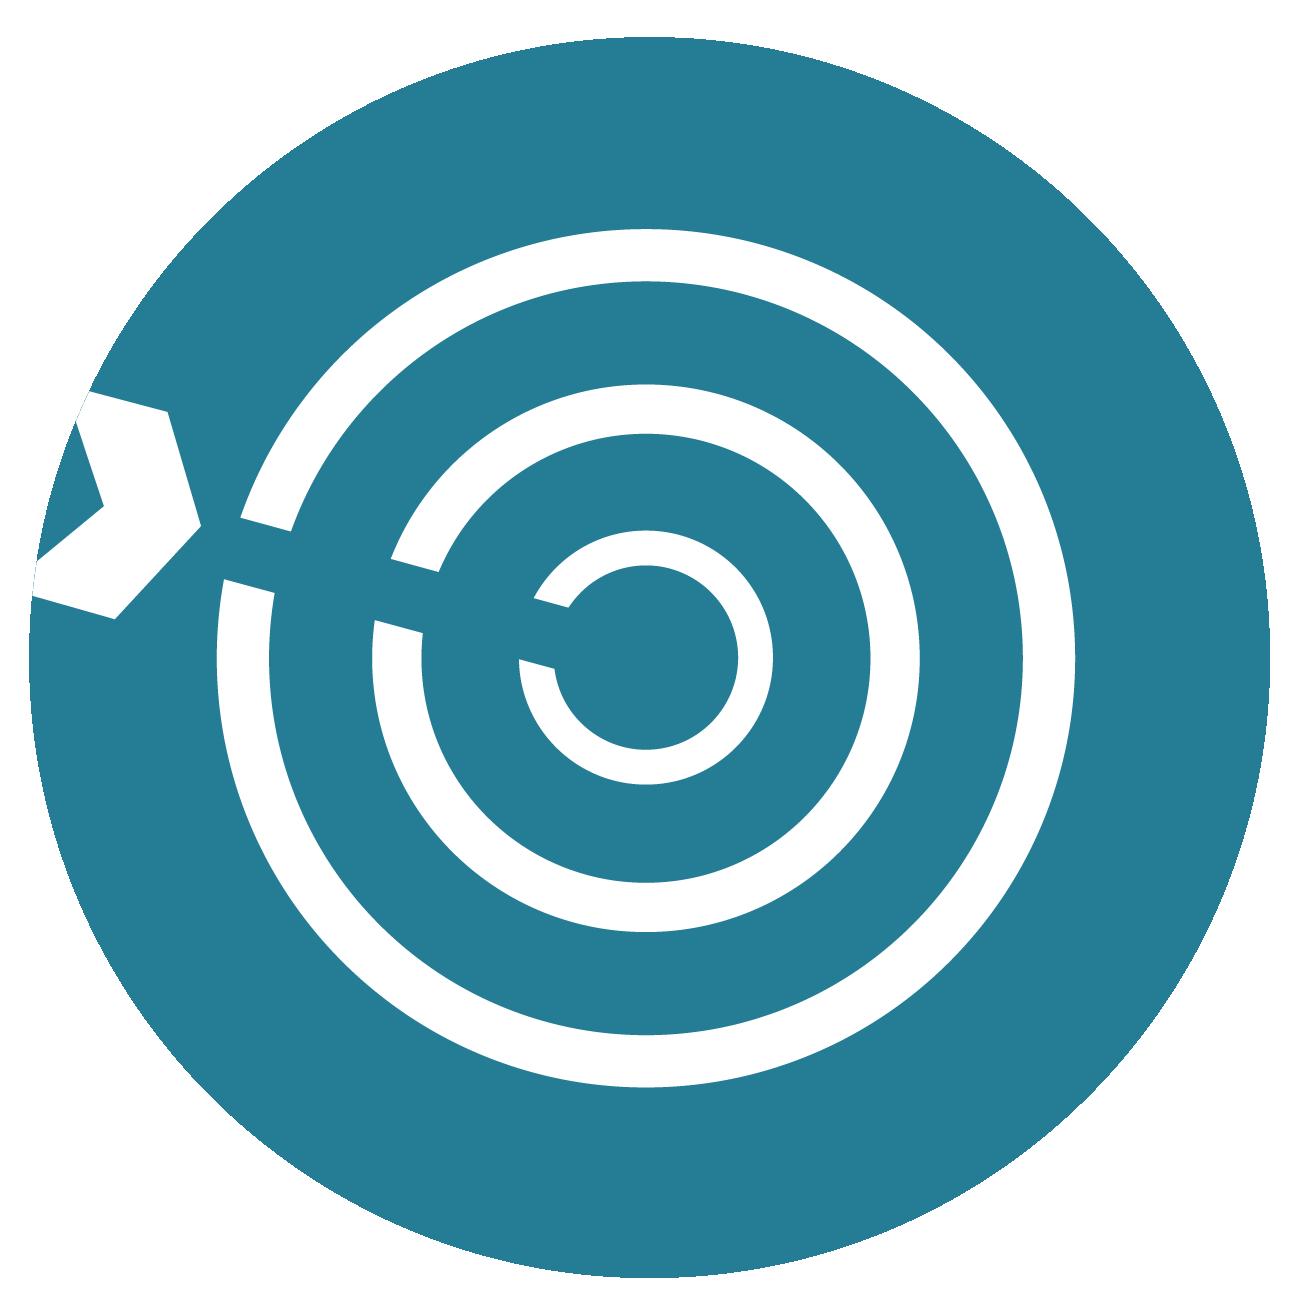 Goal-Object